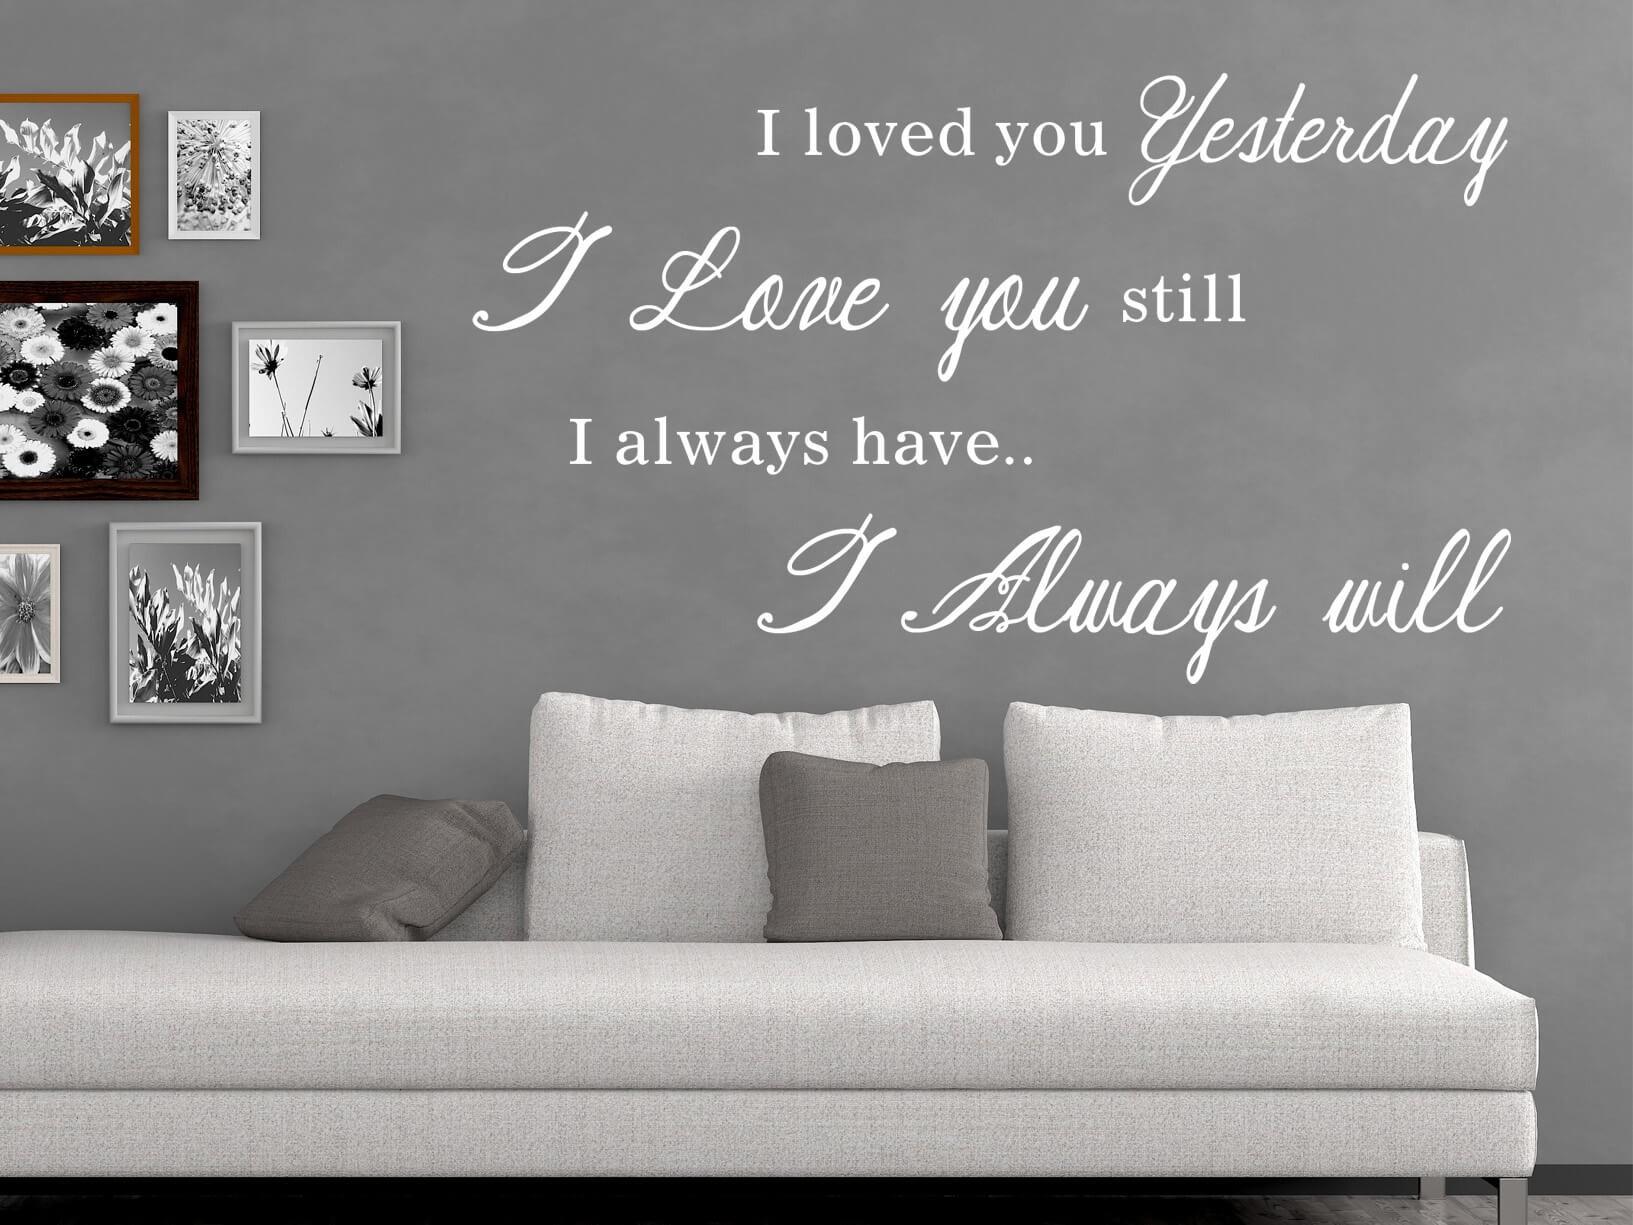 Muurstickers Slaapkamer Love.Muursticker I Loved You Yesterday I Love You Still I Always Have